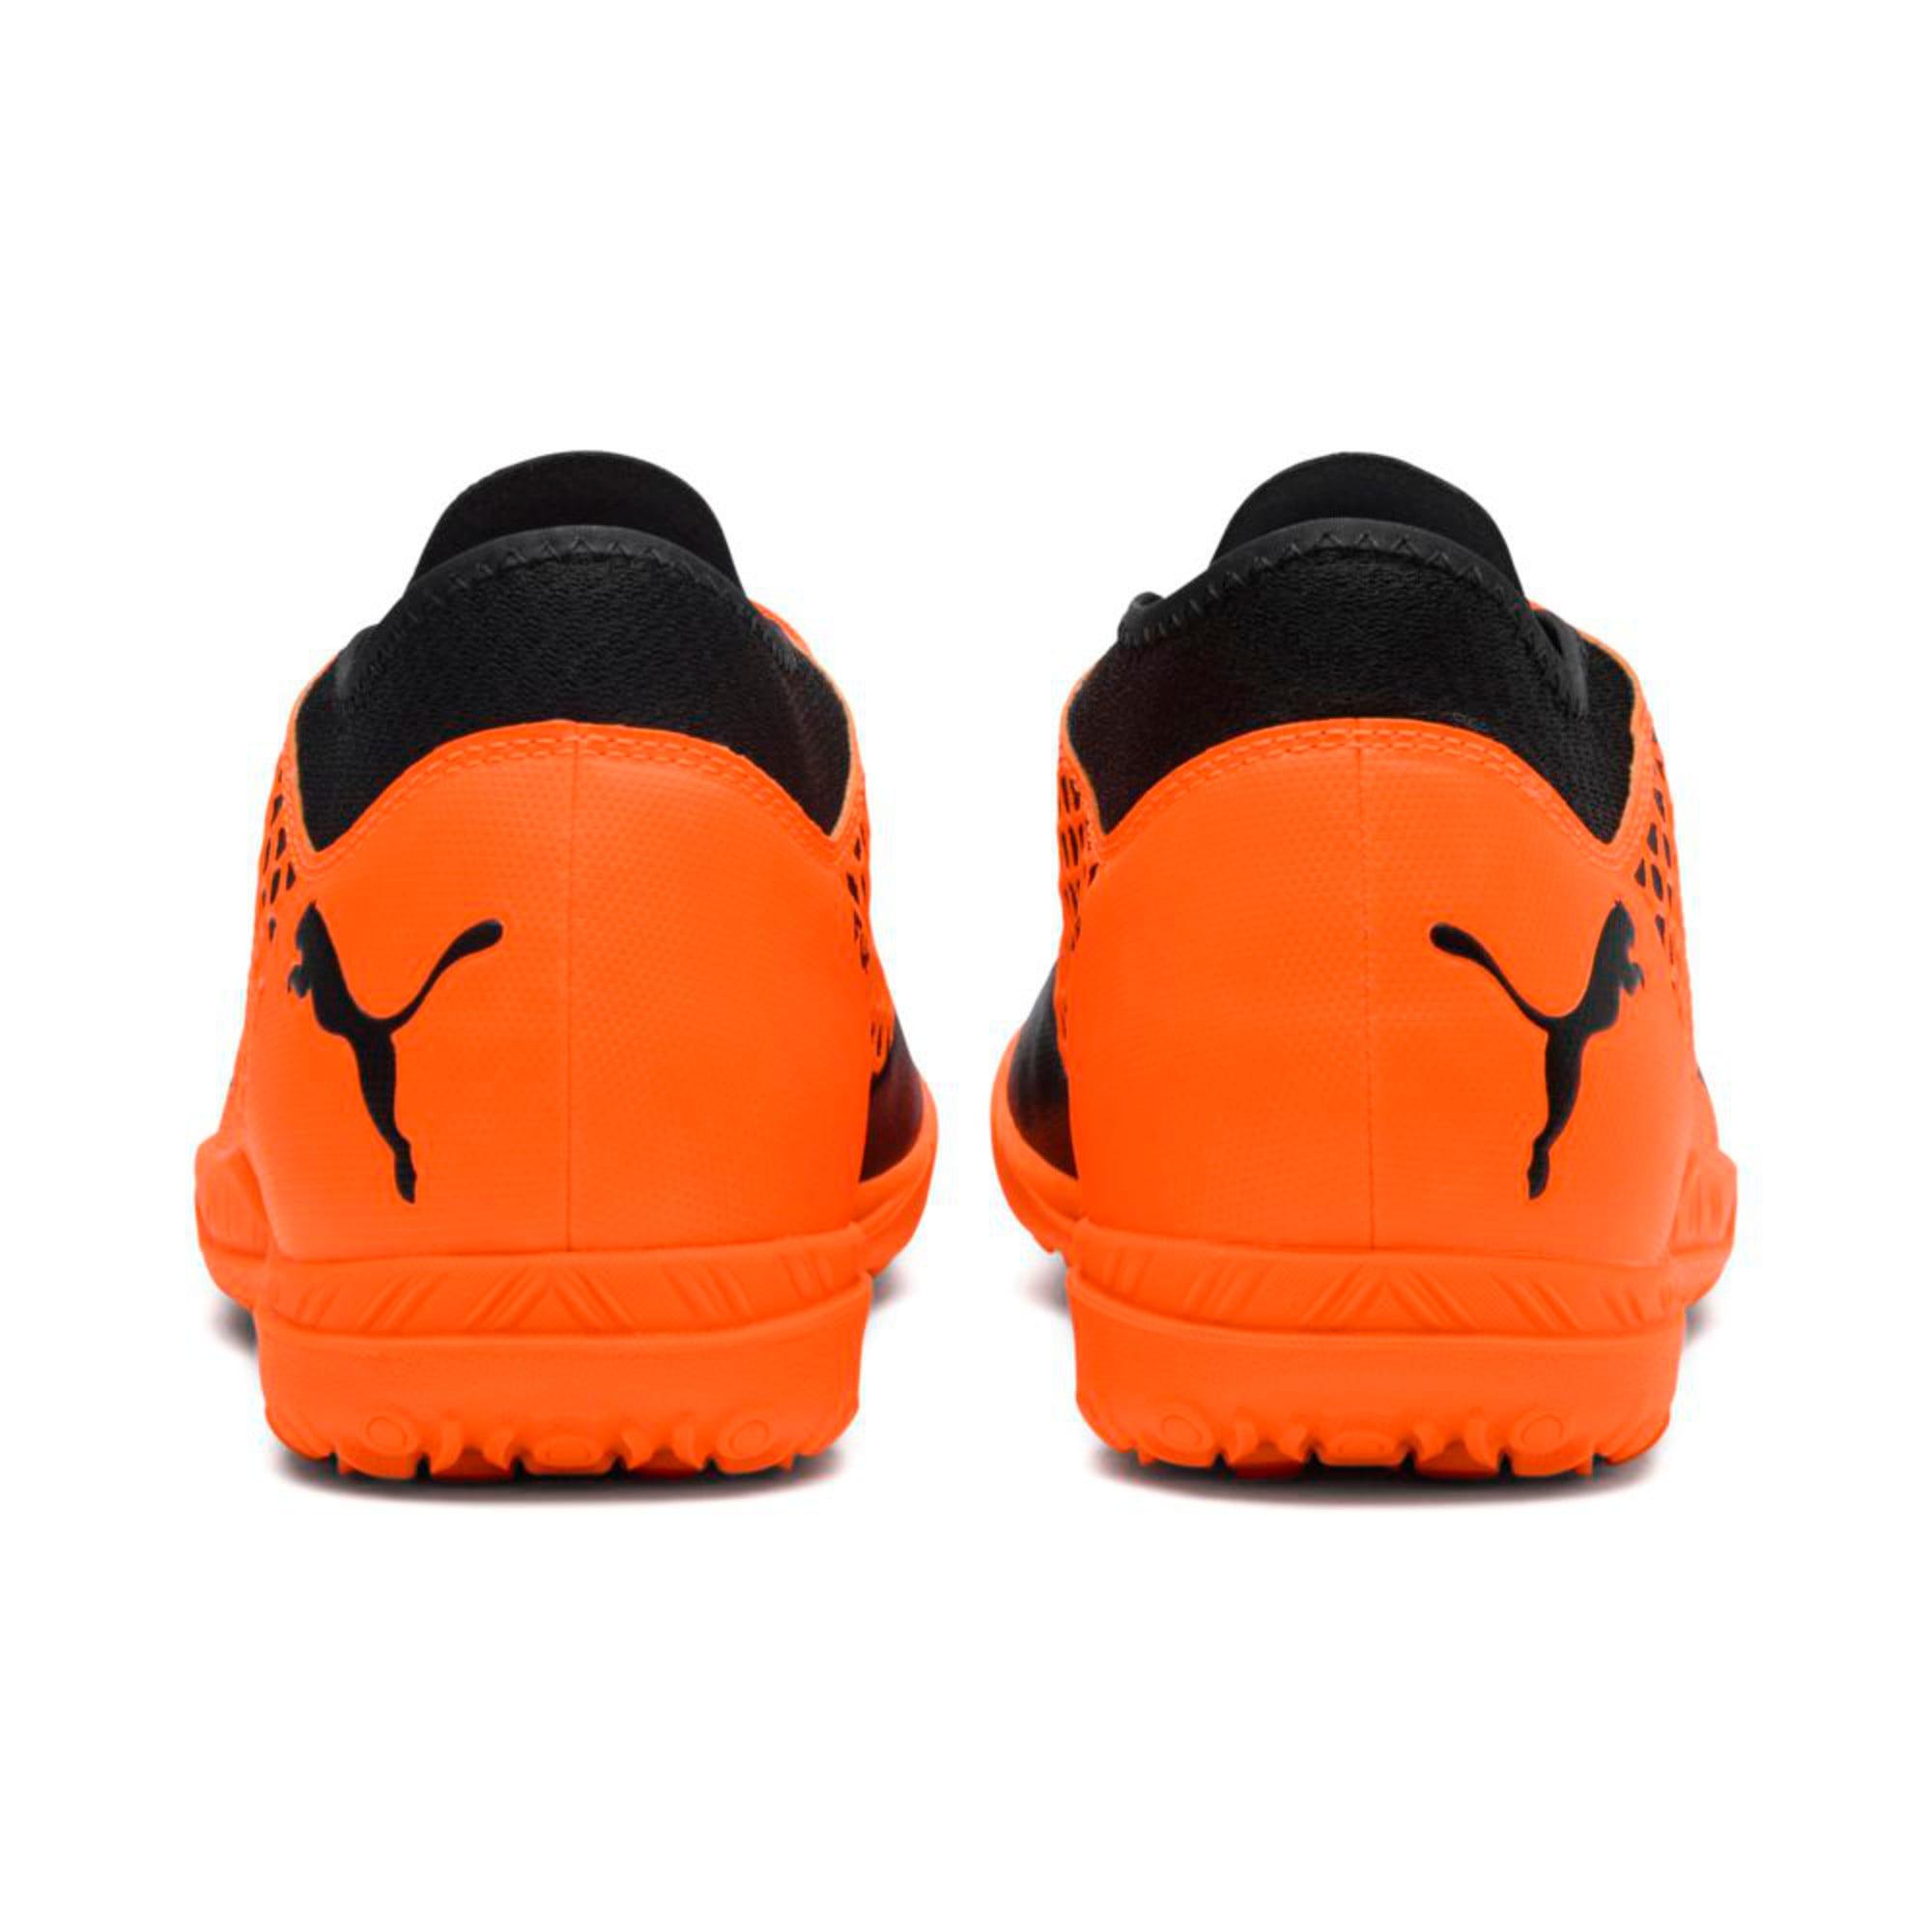 Thumbnail 4 of FUTURE 2.4 TT Men's Football Boots, Puma Black-Shocking Orange, medium-IND